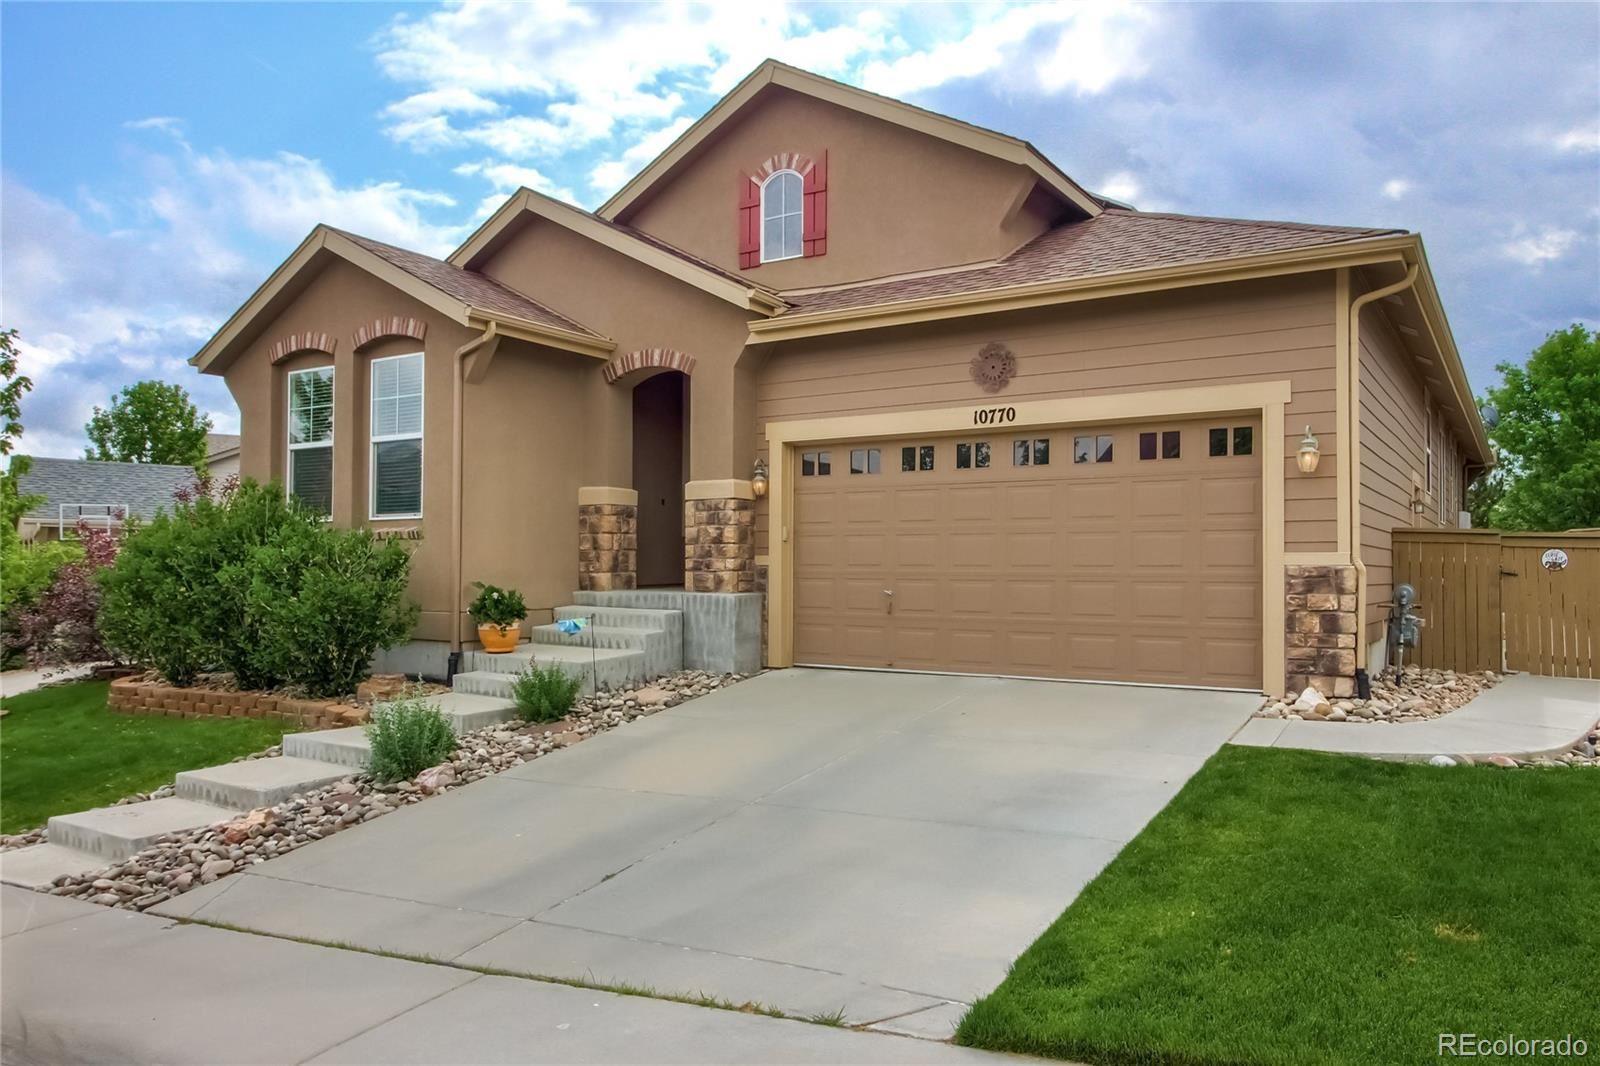 10770 Huntwick Street, Highlands Ranch, CO 80130 - #: 4558655